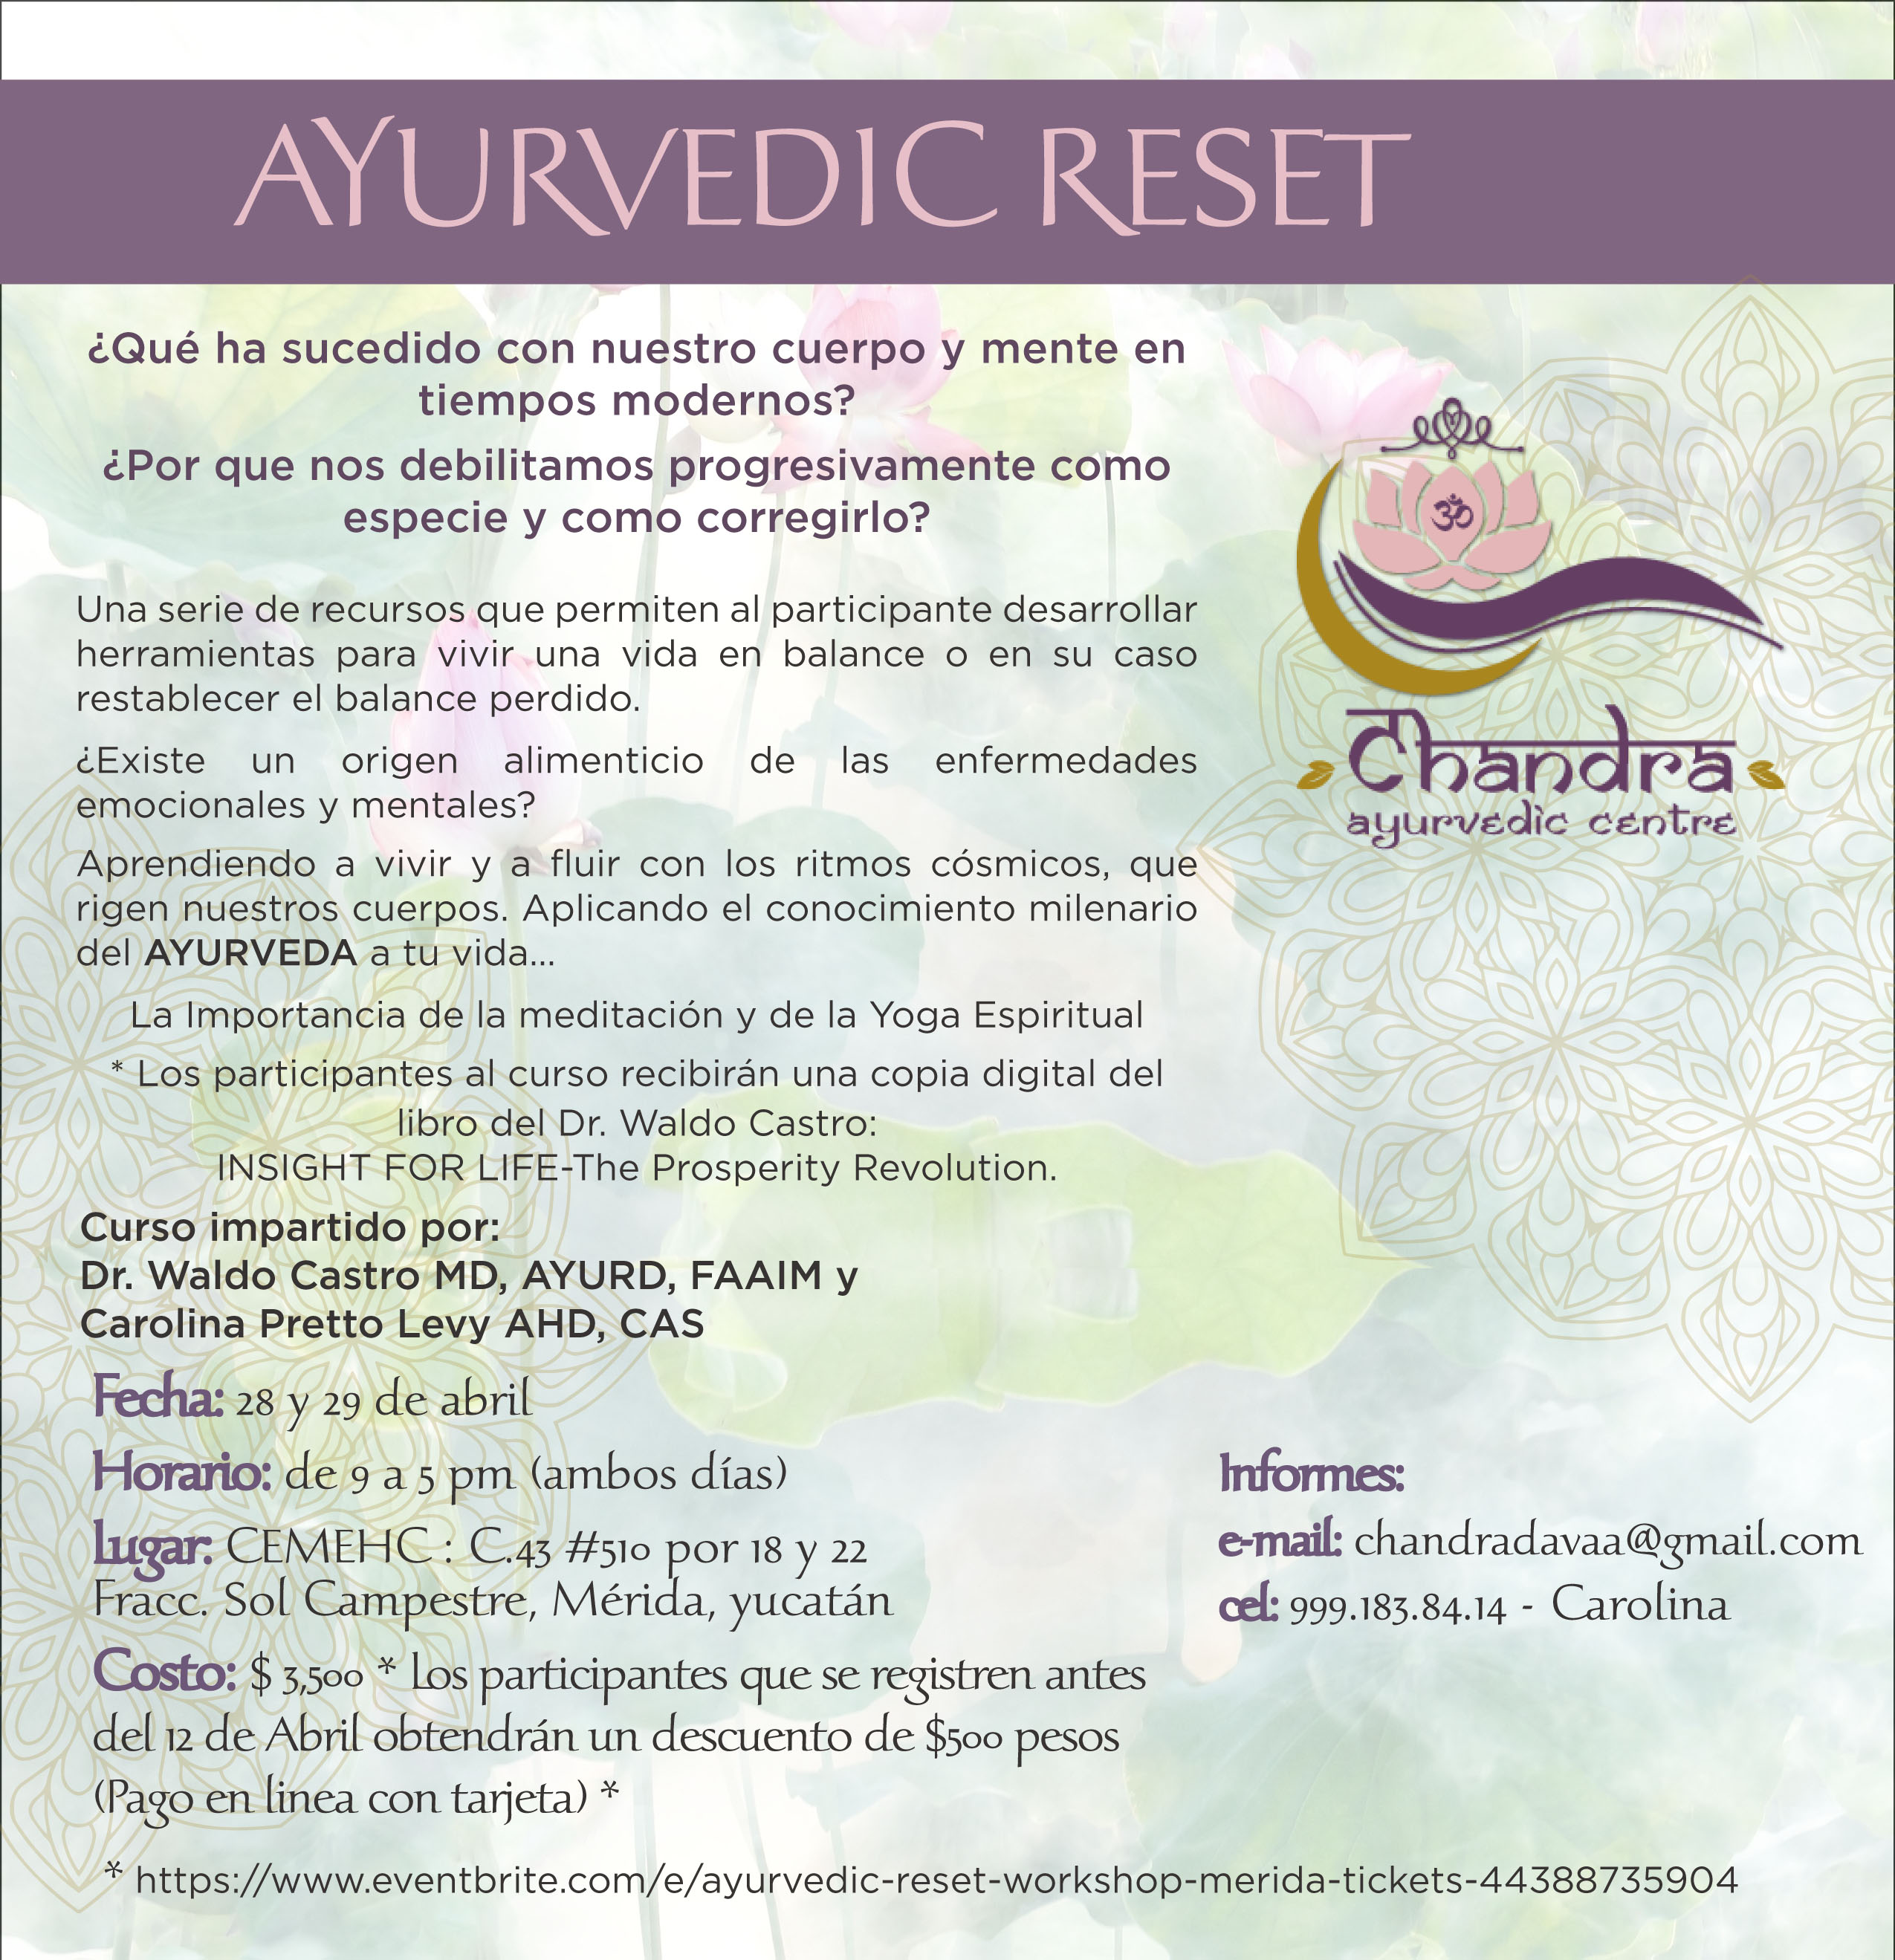 Ayurvedic Reset